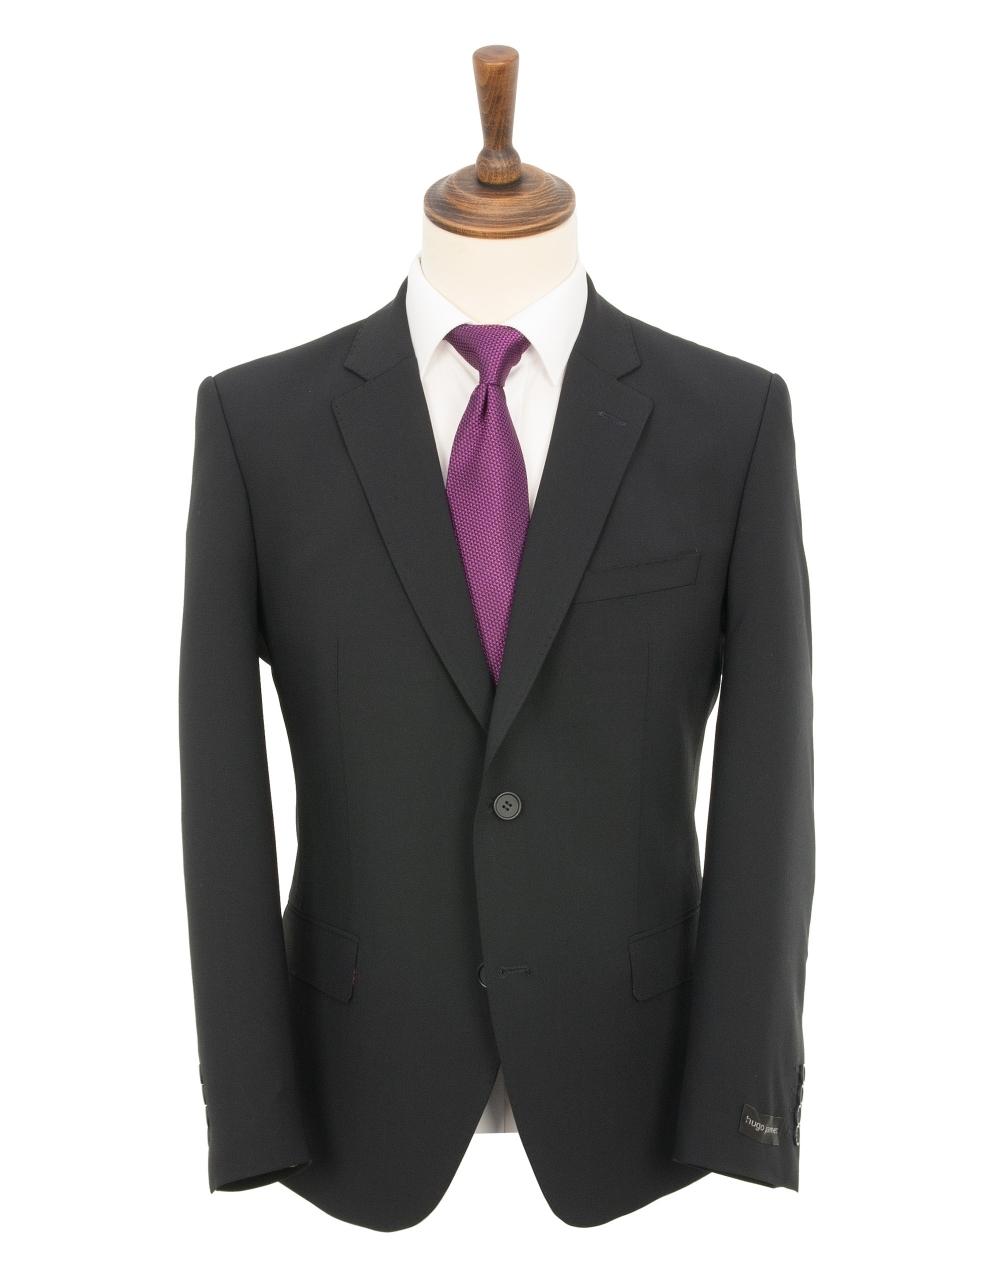 a5e5371afaa8 Plain Quattro Bi-Stretch Suit - Dark Navy